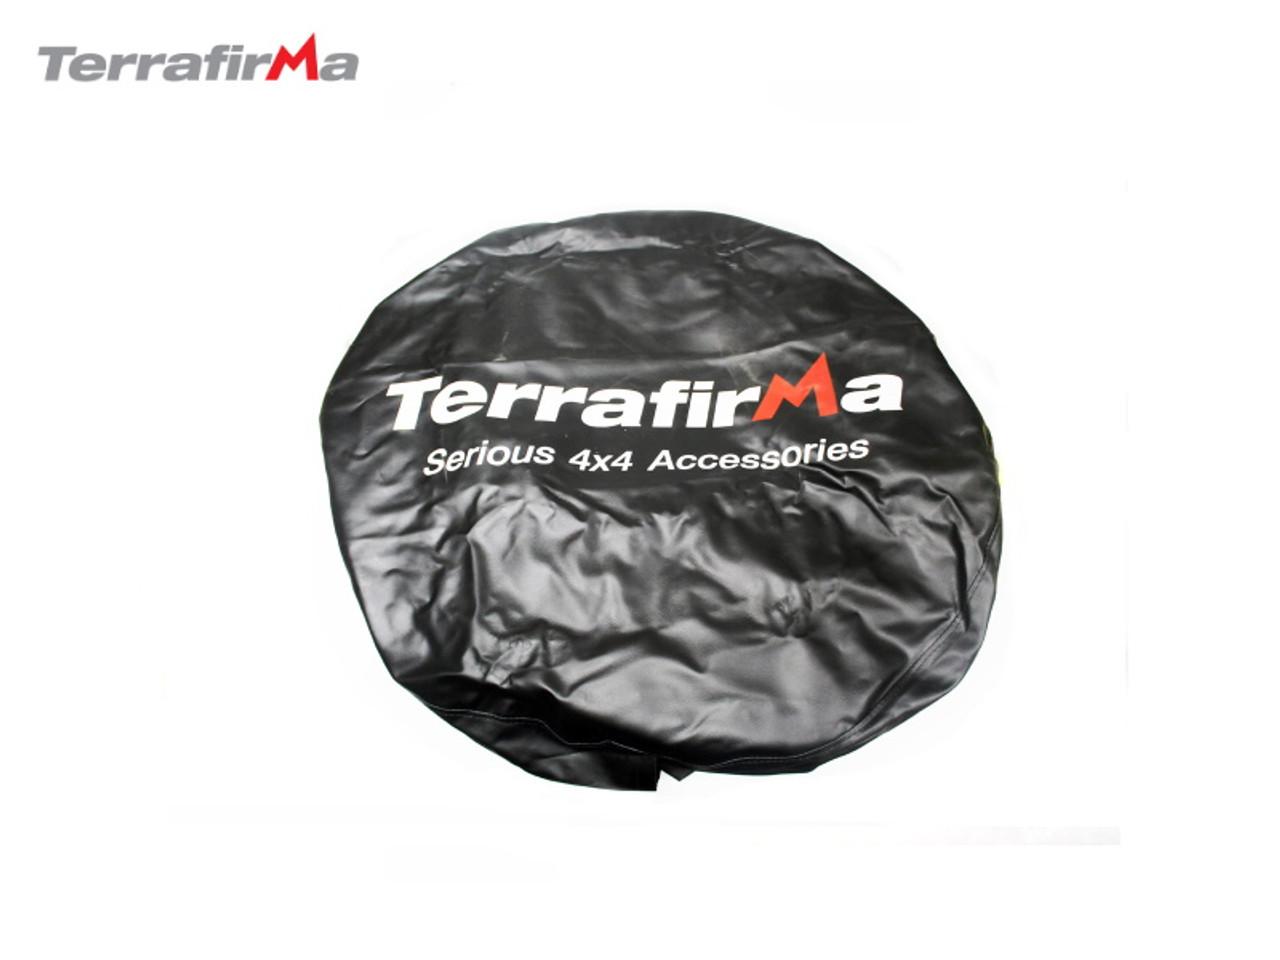 Terrafirma Spare Wheel Cover